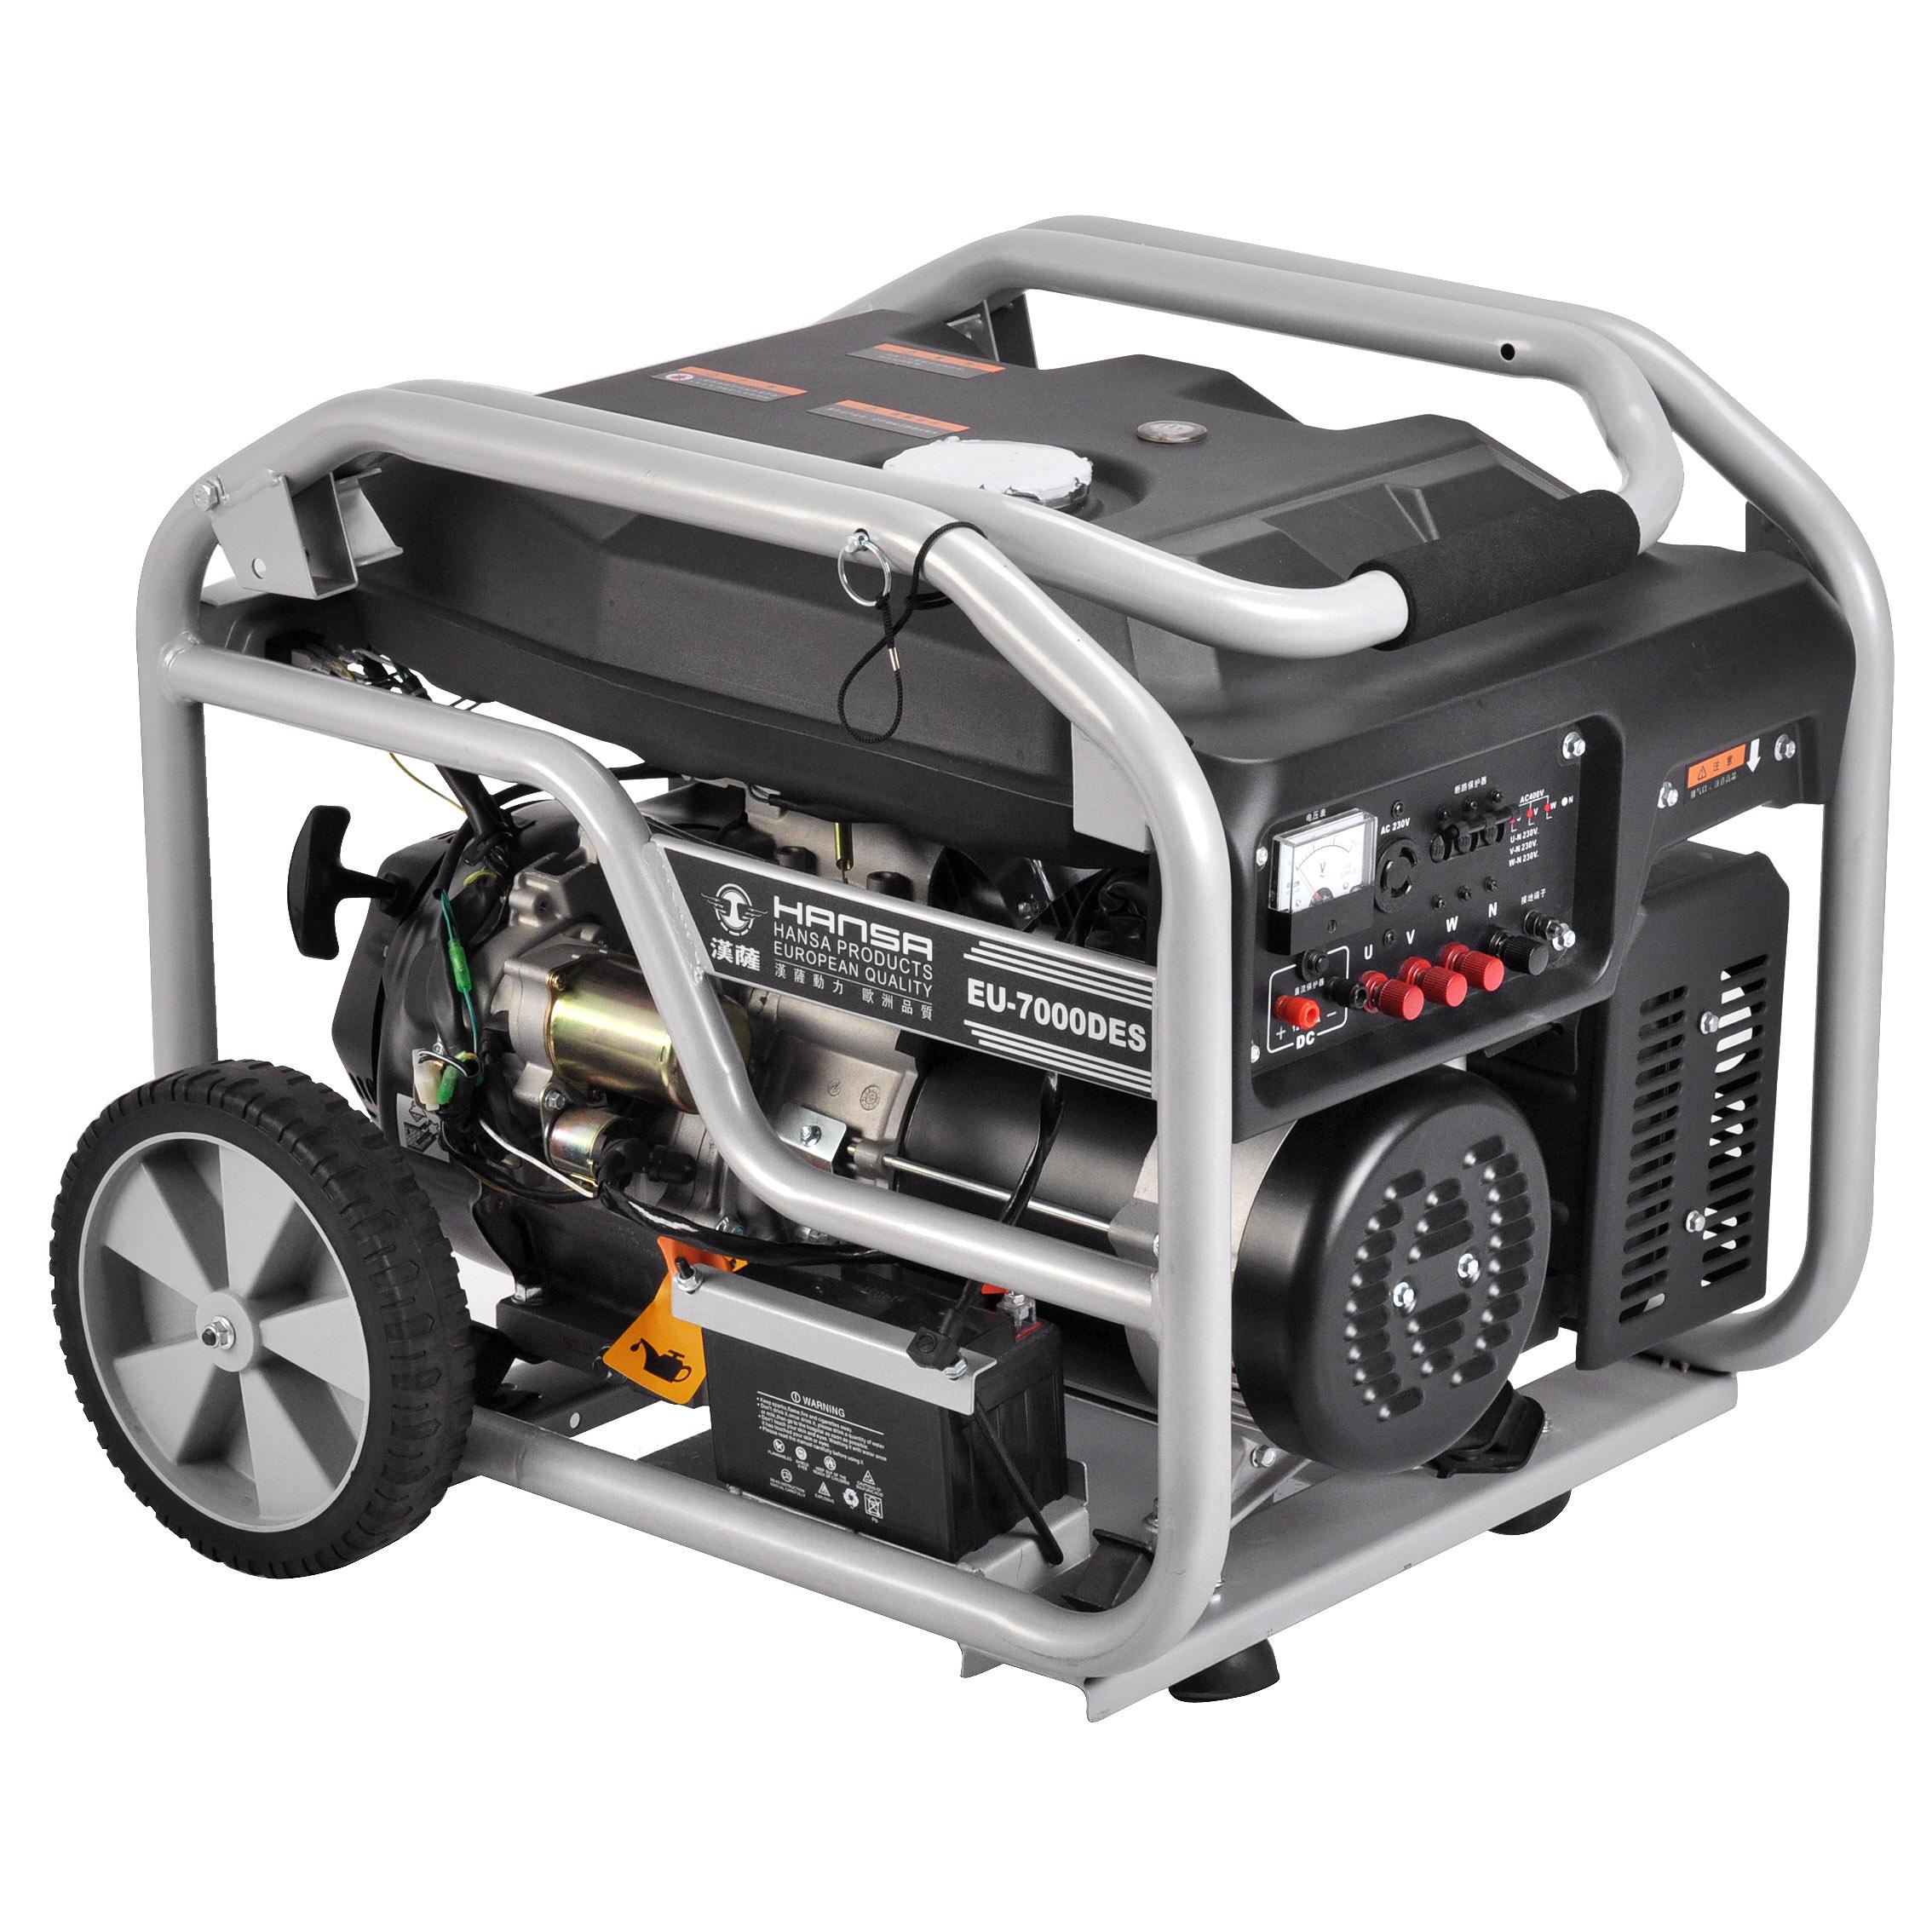 6KW三相单杠四冲程汽油发电机——EU-7000DES